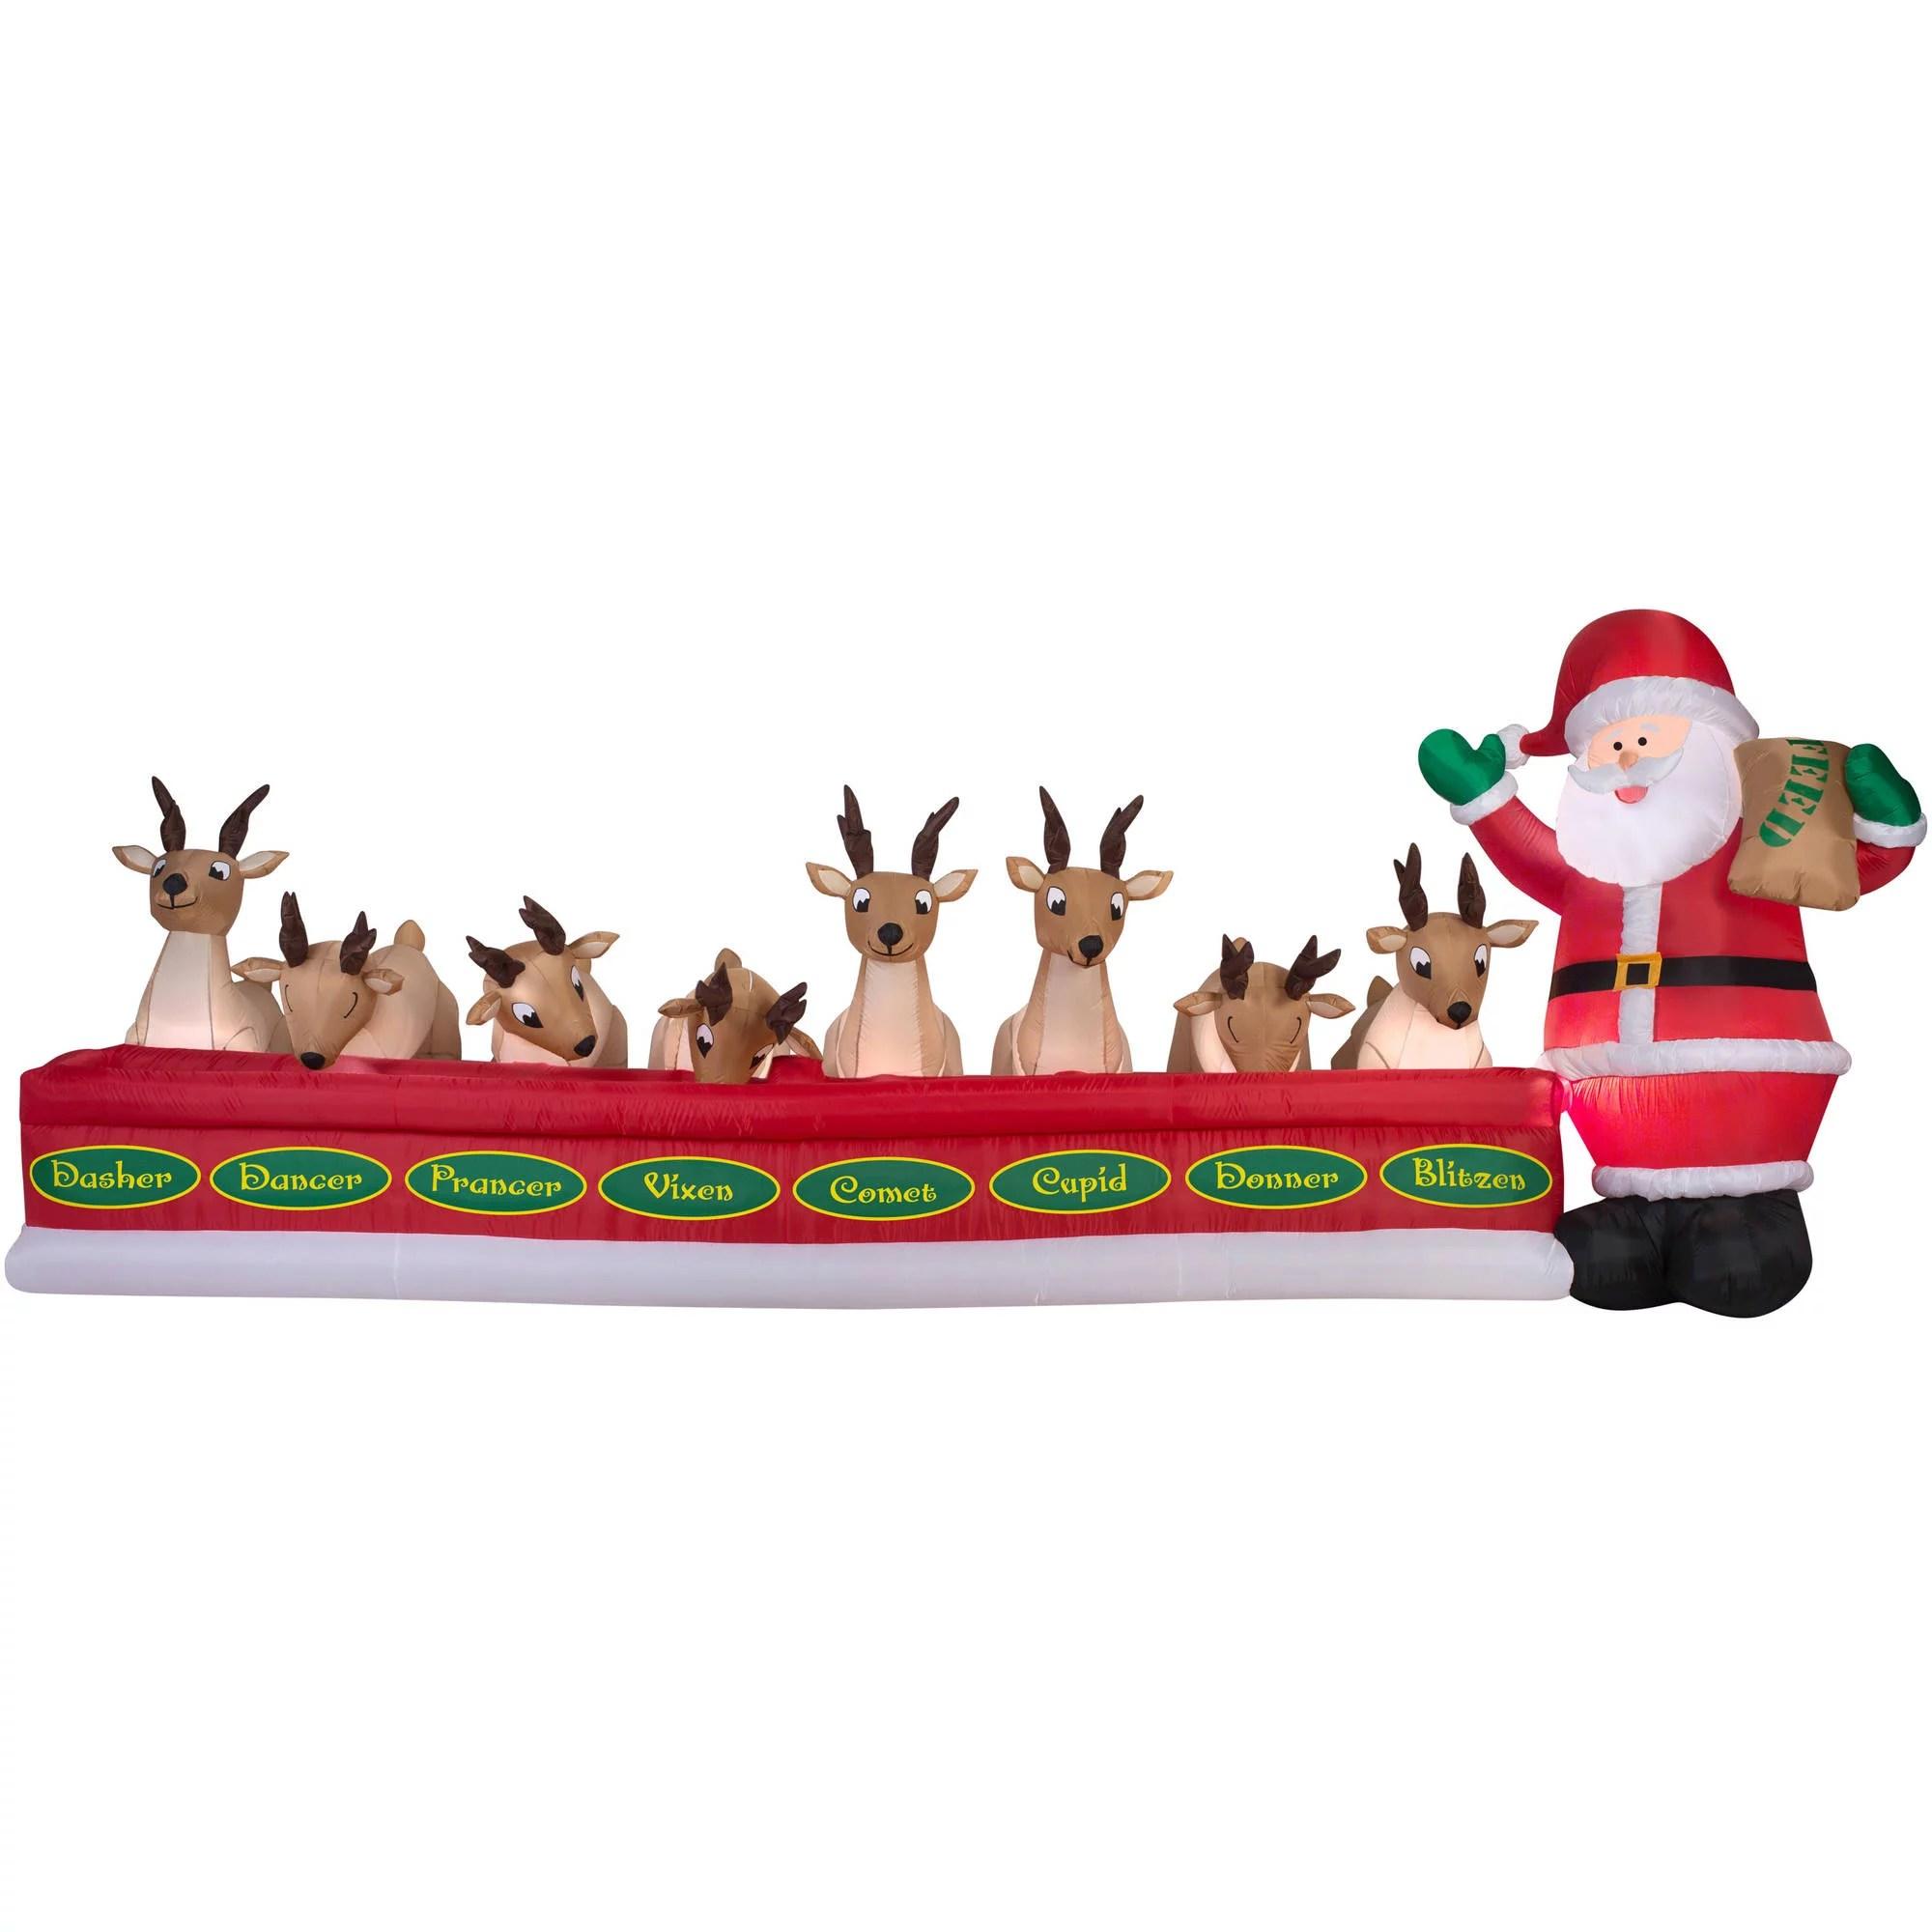 Airblown Inflatables Animated Santa Feeding Reindeer 16 5